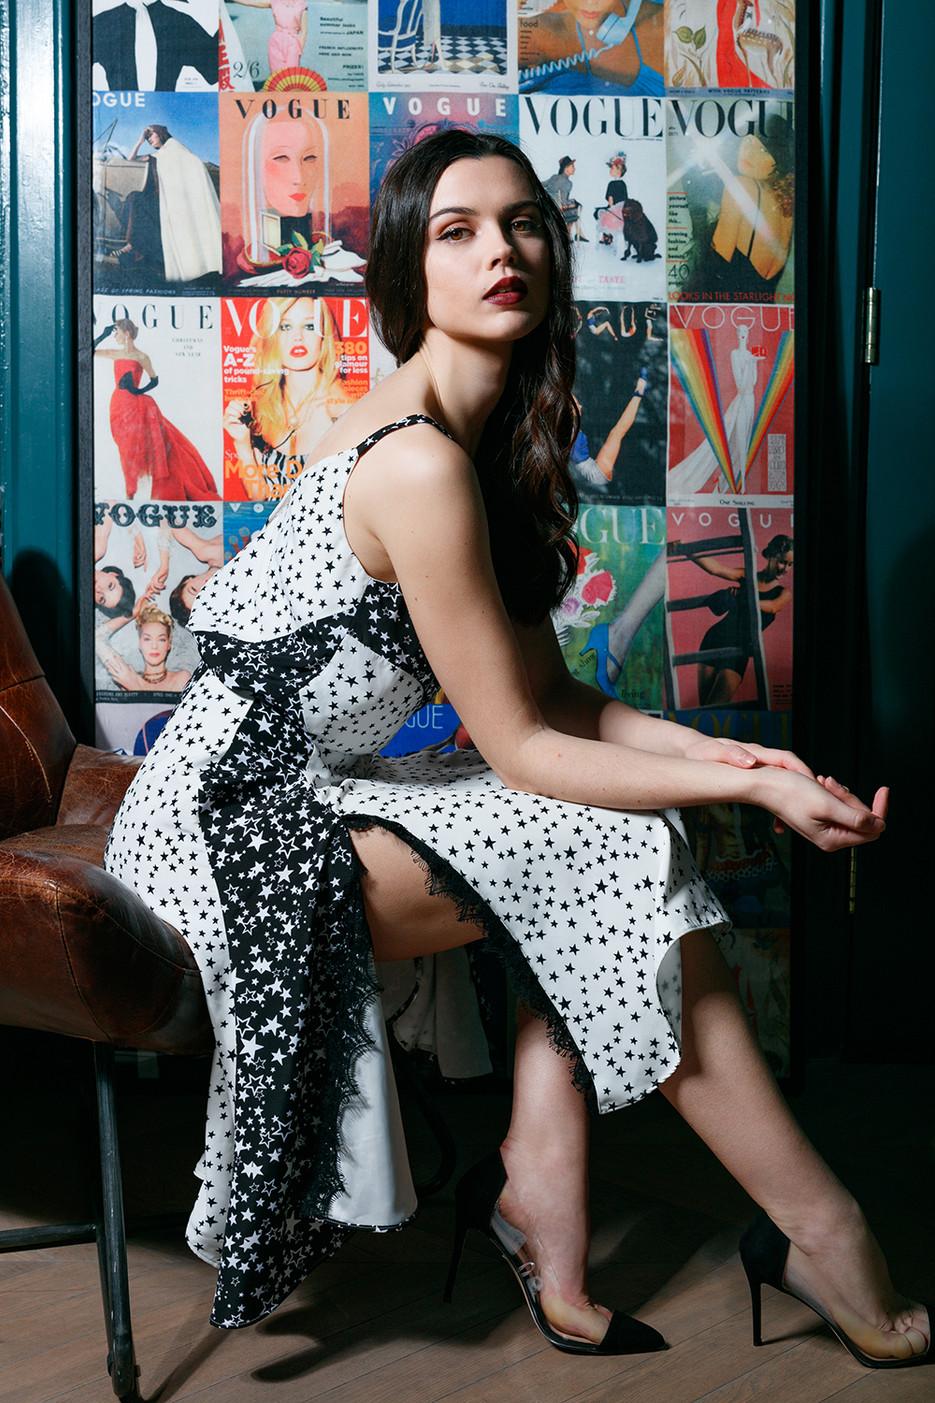 Atalier-Star-Skirt-and-Cami.jpg